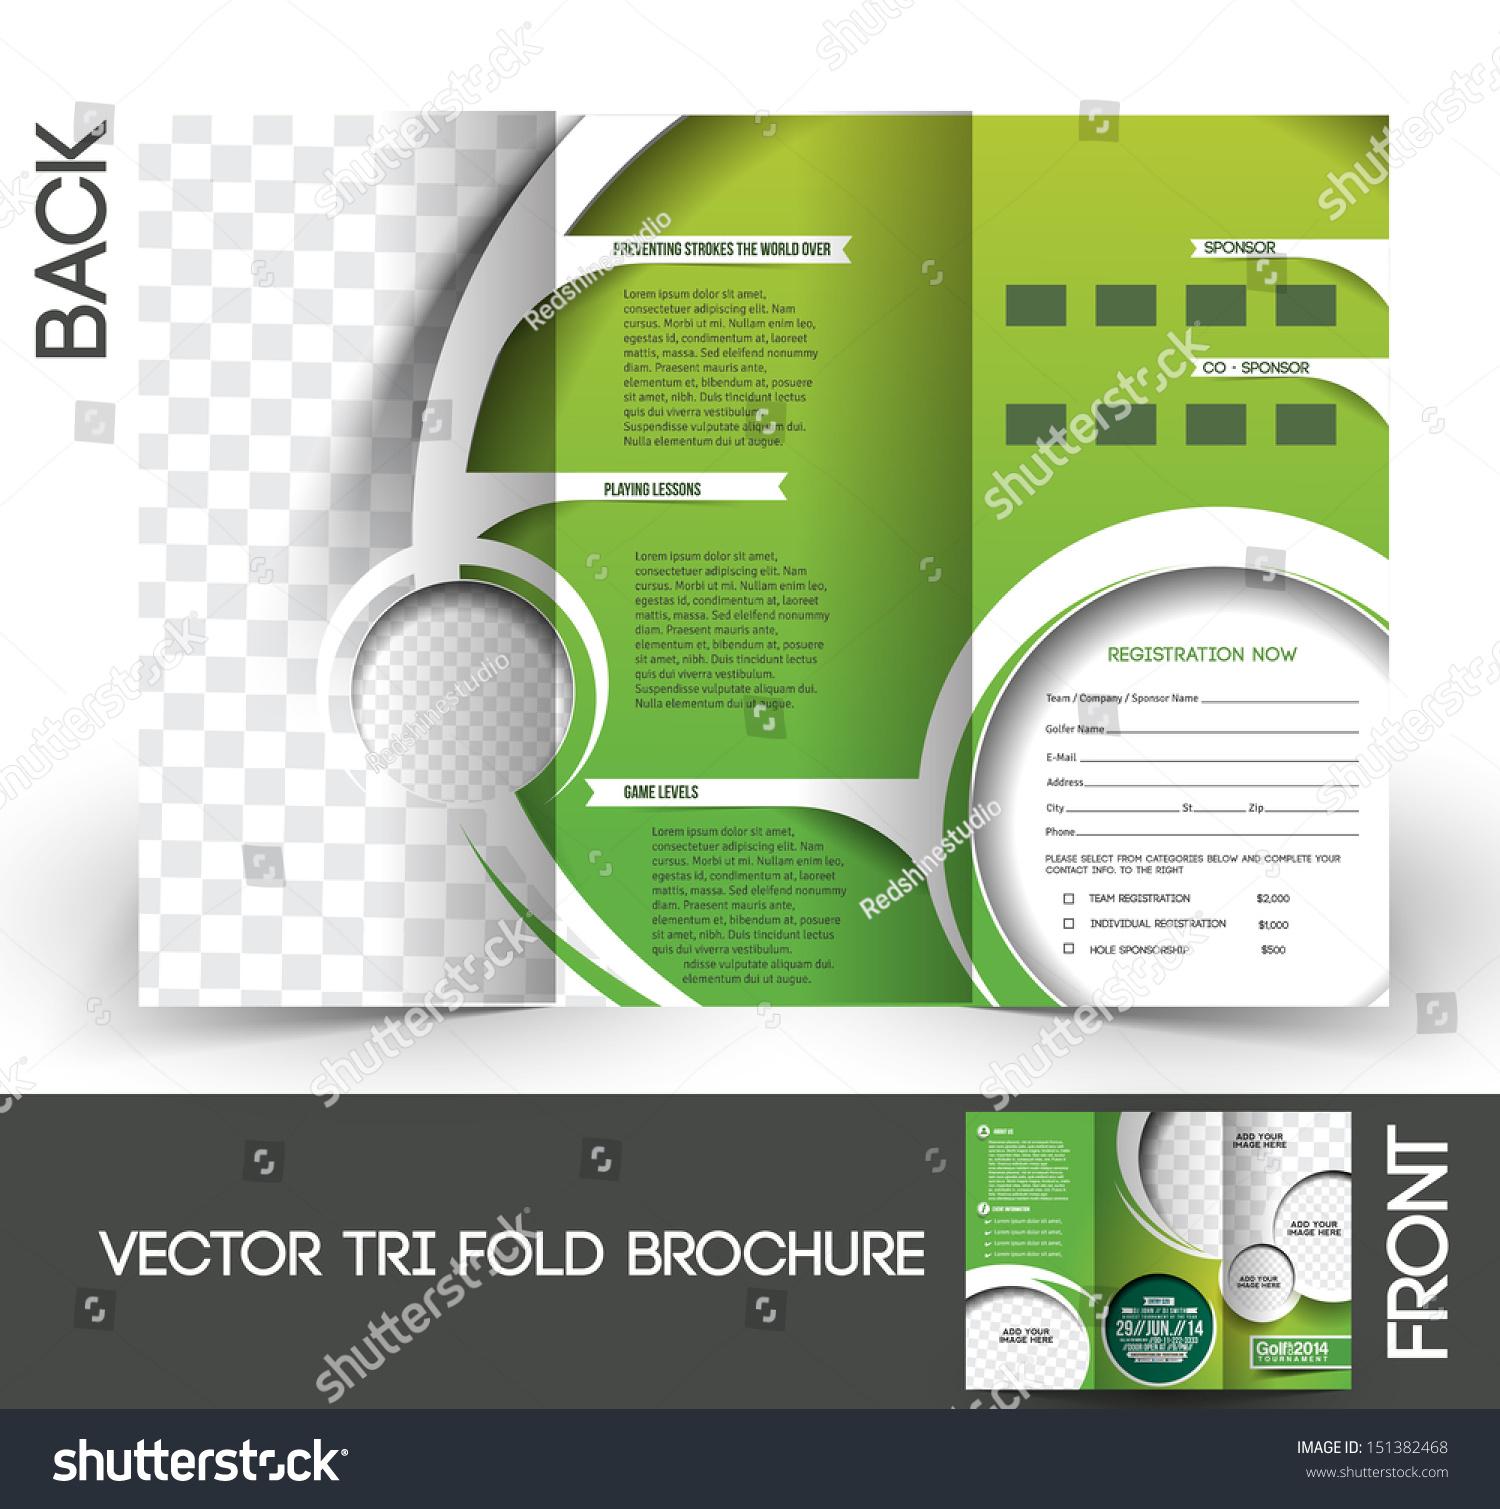 Trifold golf tournament mock brochure design stock vector for Golf tournament brochure template